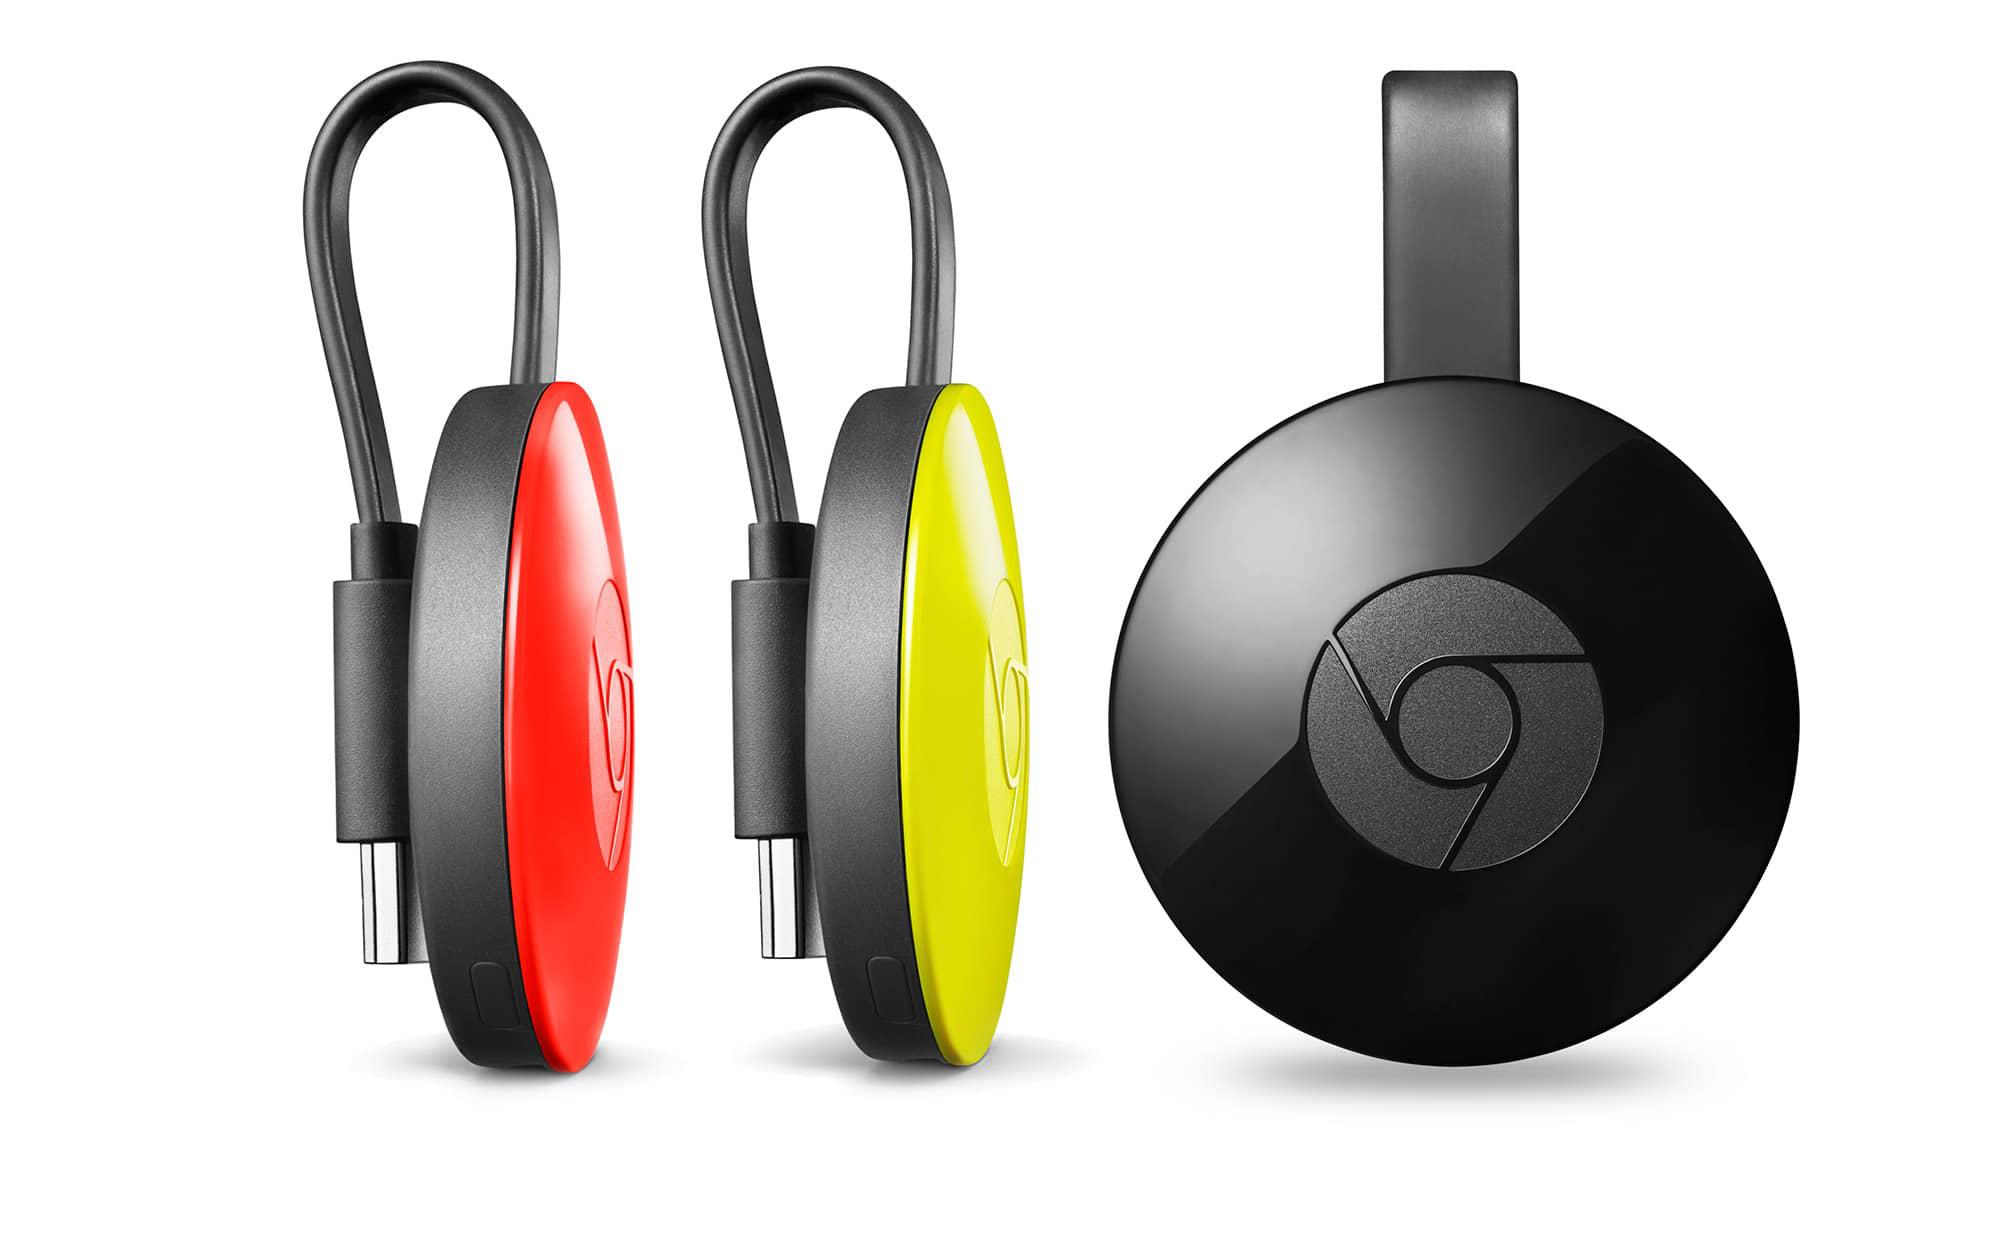 How To Use Google Chromecast On Iphone